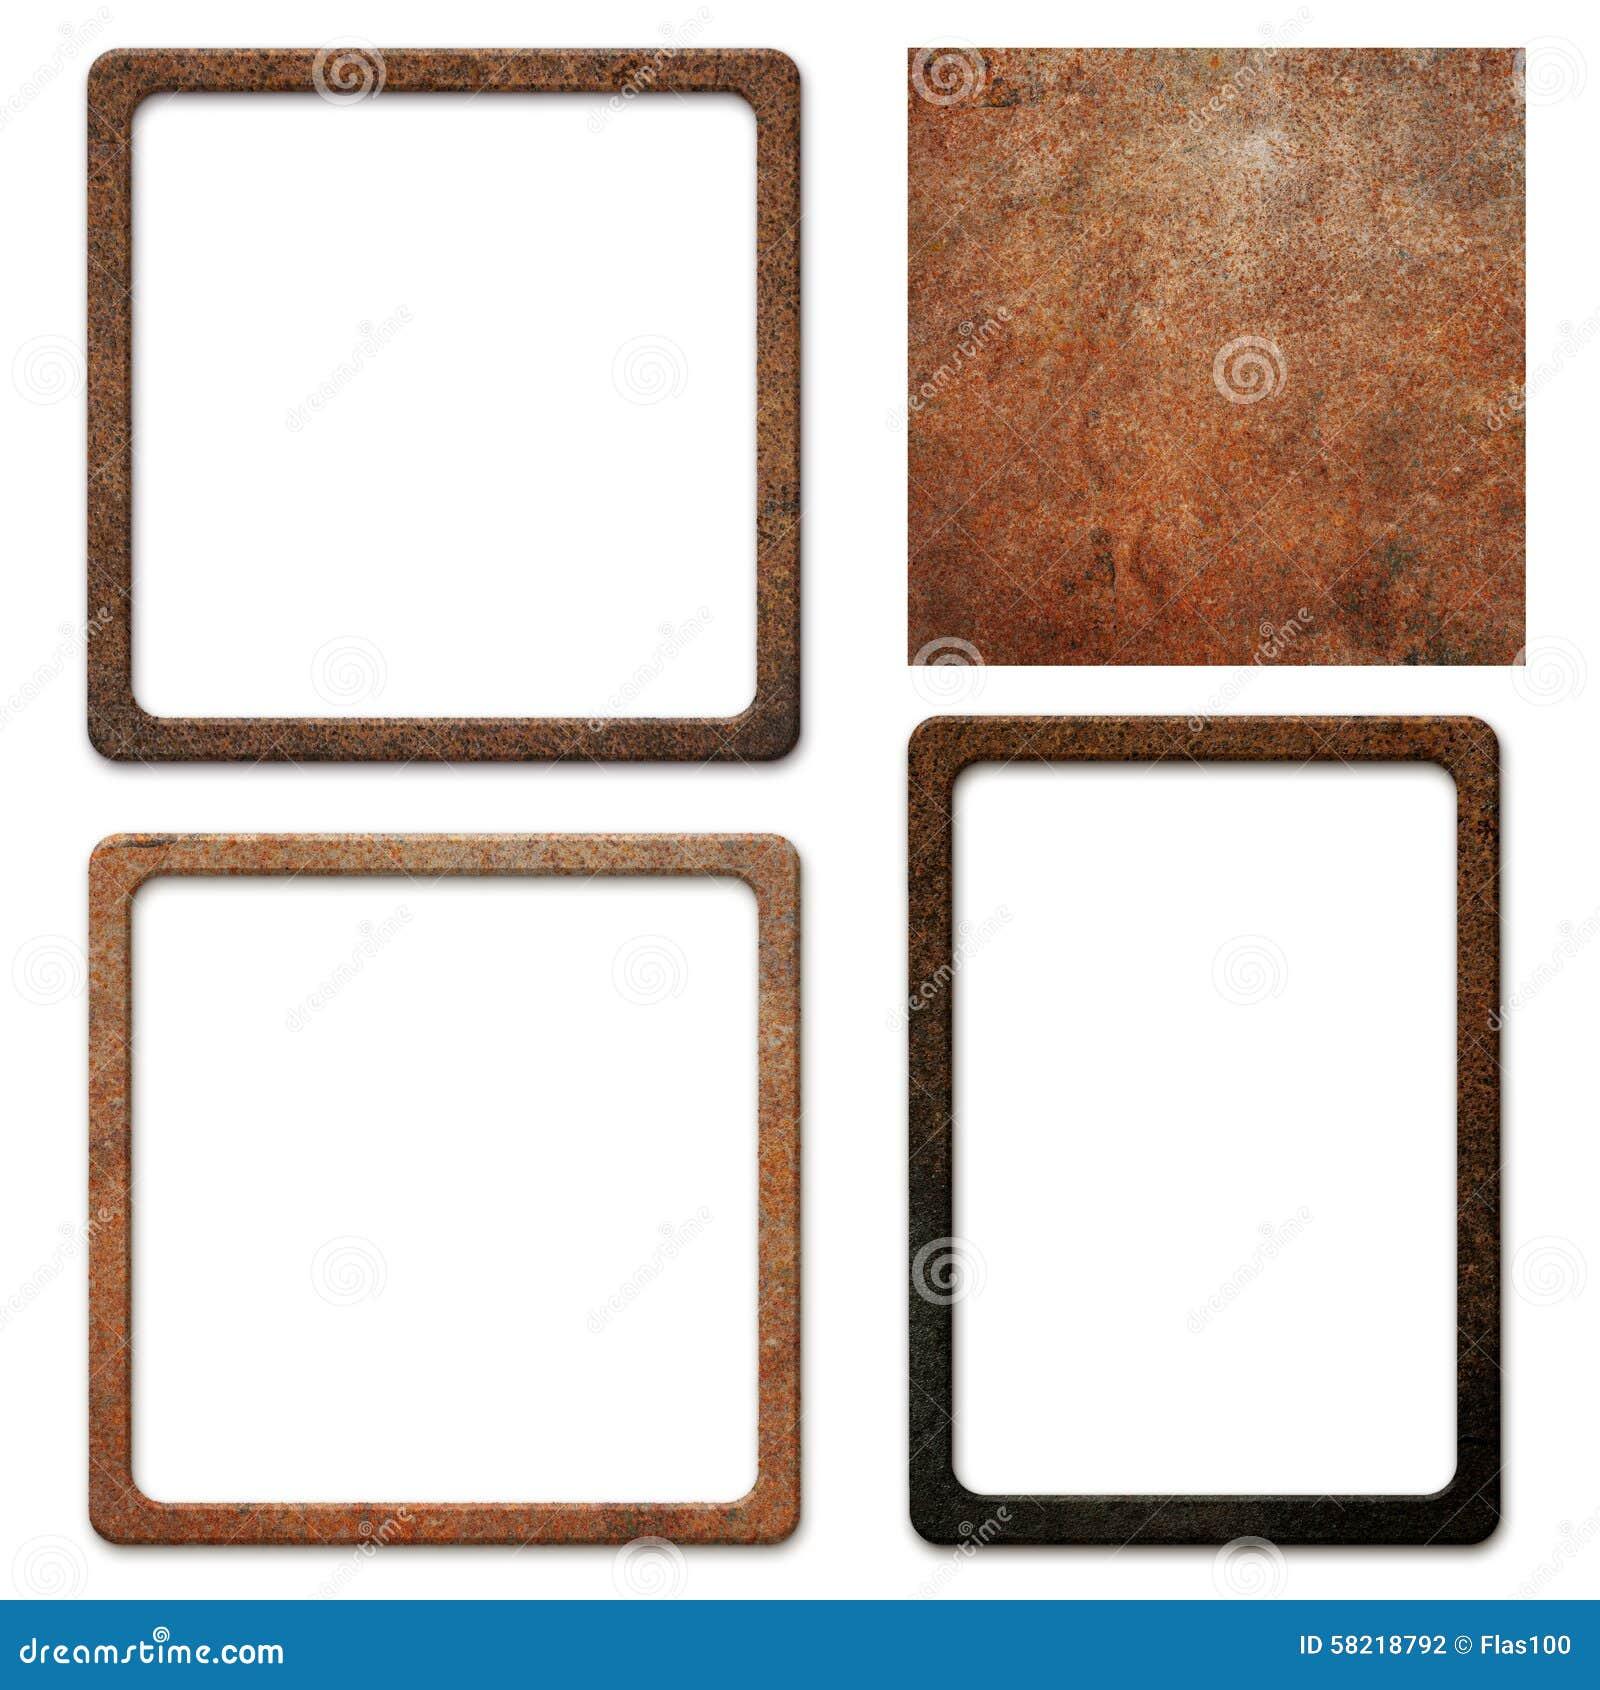 alte schmutzige rostige metallplatte mit rahmen stockfoto bild 58218792. Black Bedroom Furniture Sets. Home Design Ideas